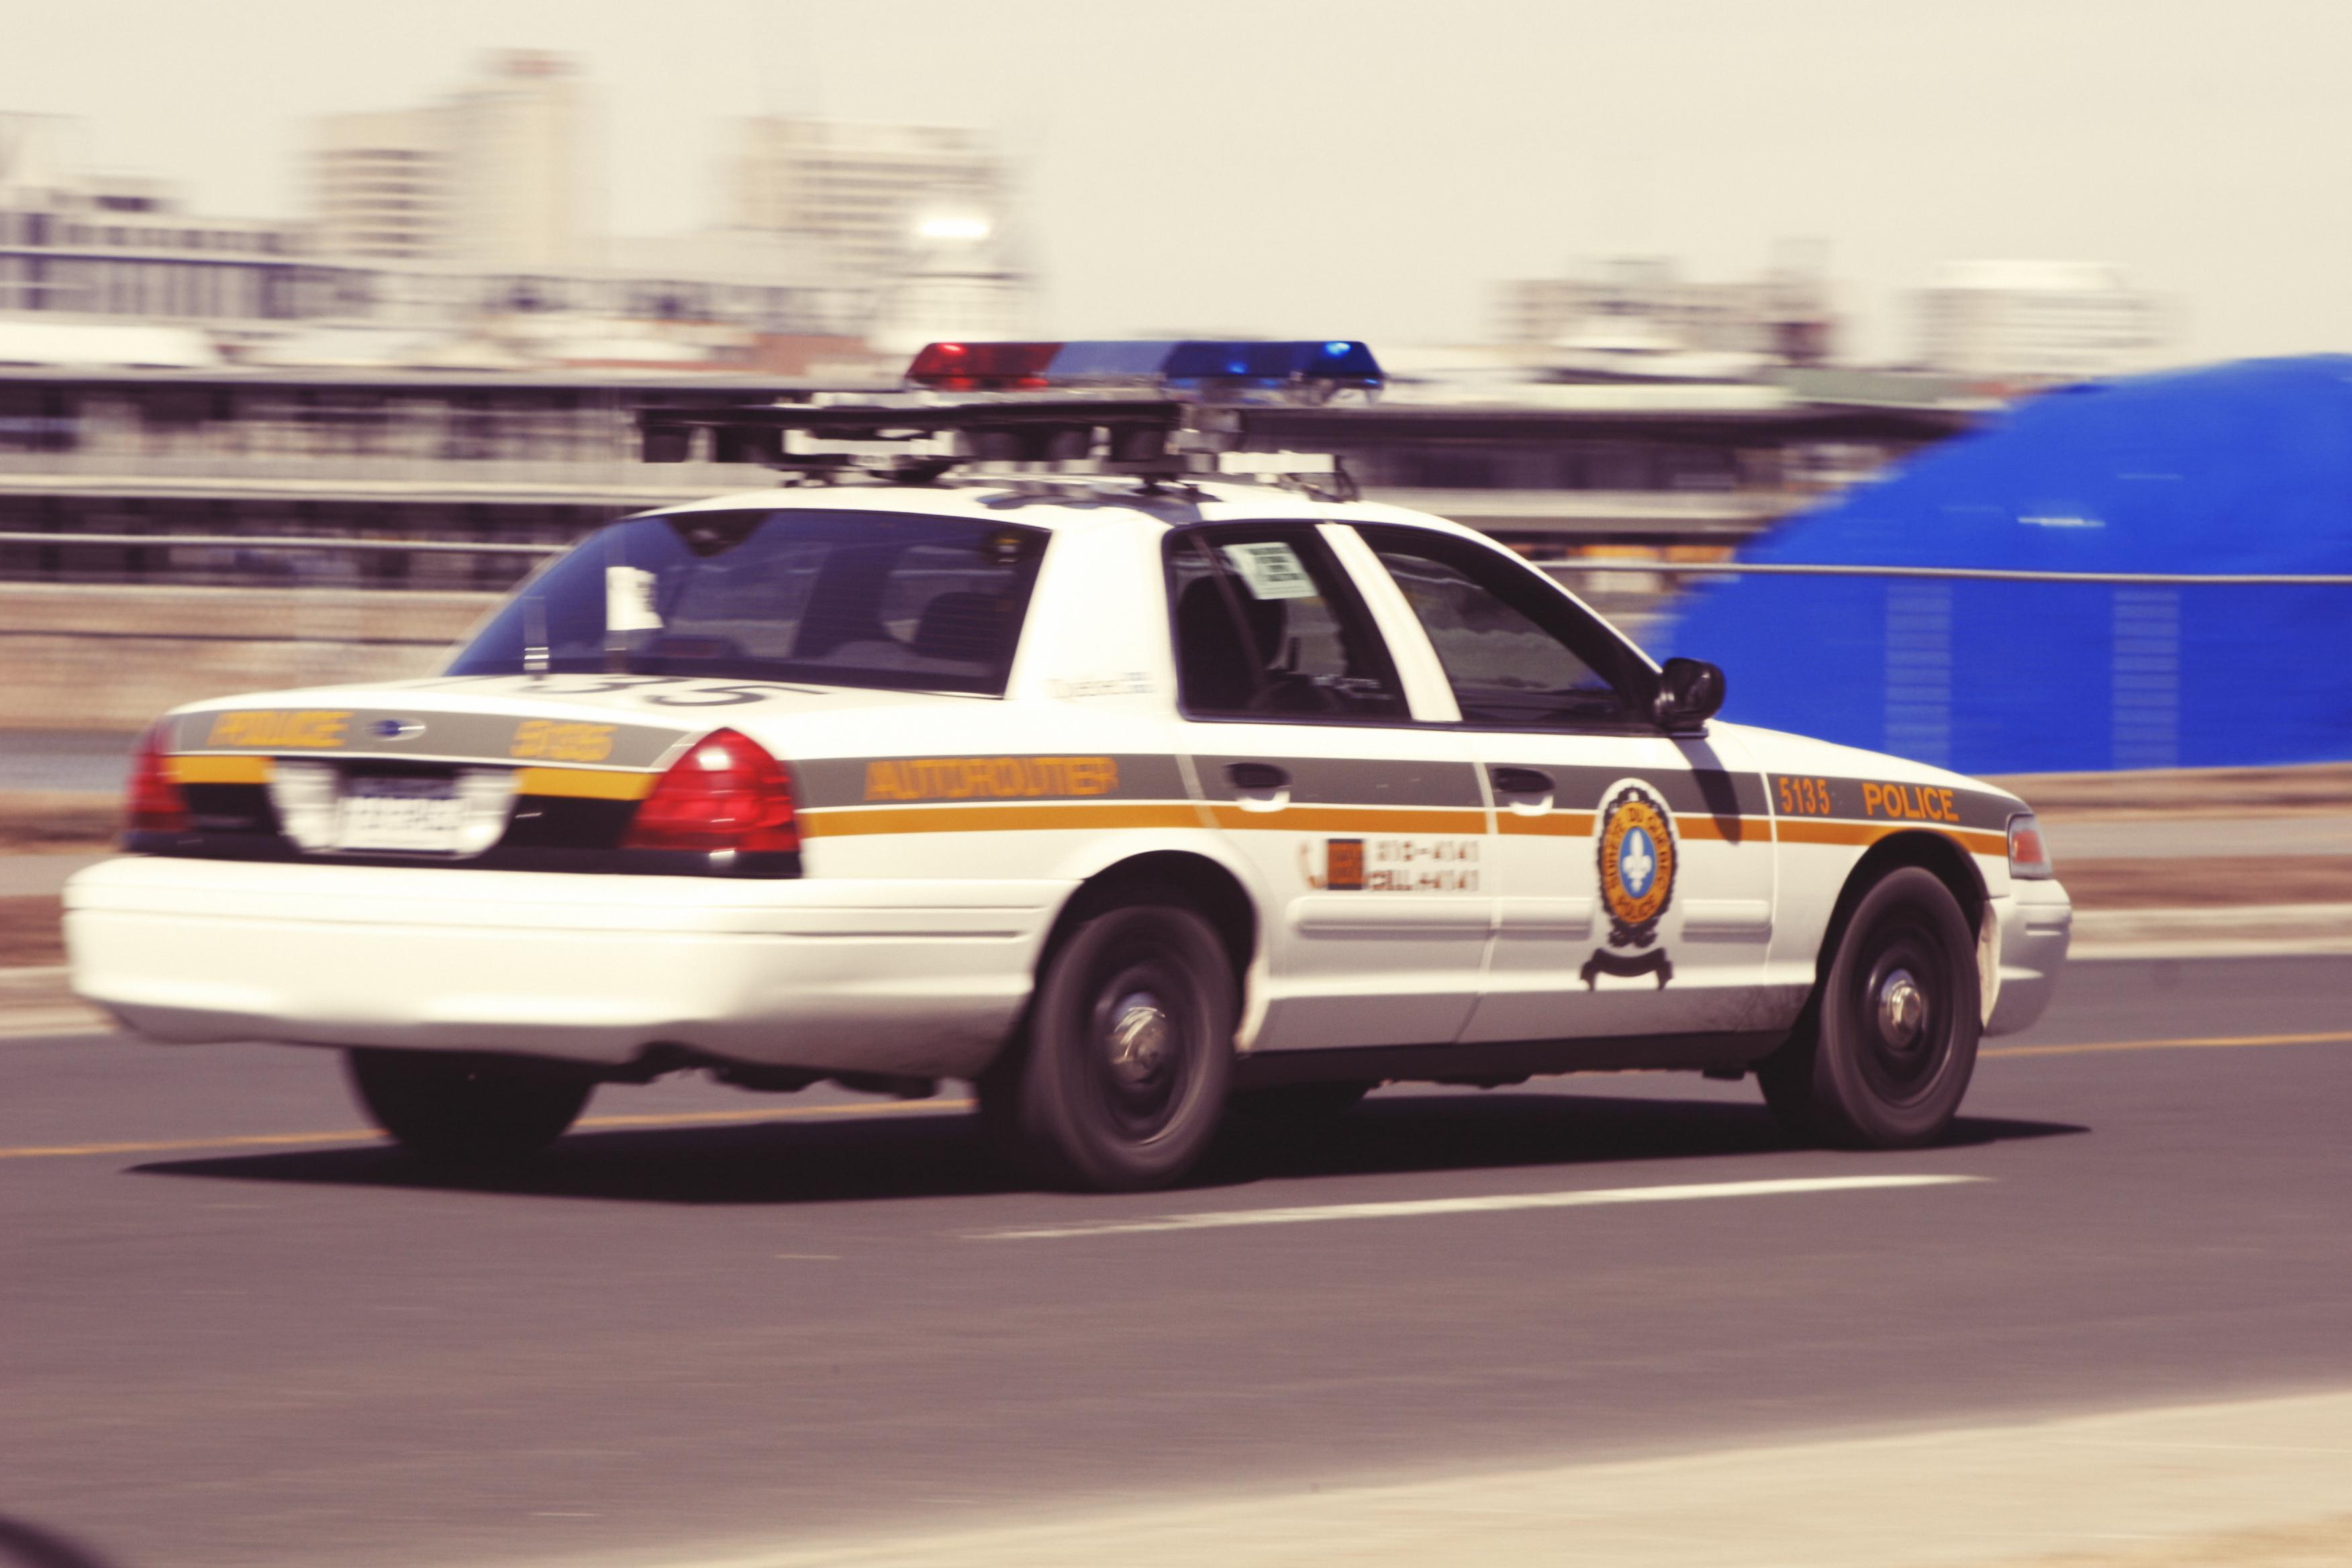 Police Car, Car, Cop, Police, Road, HQ Photo